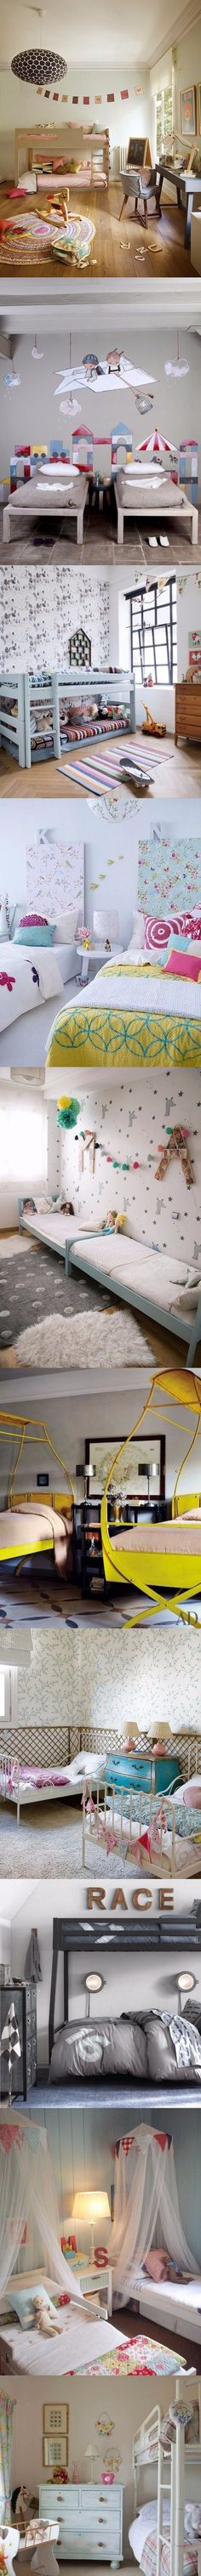 12 dormitorios infantiles para inspirarse / http://www.tendenciasydecoracion.com/